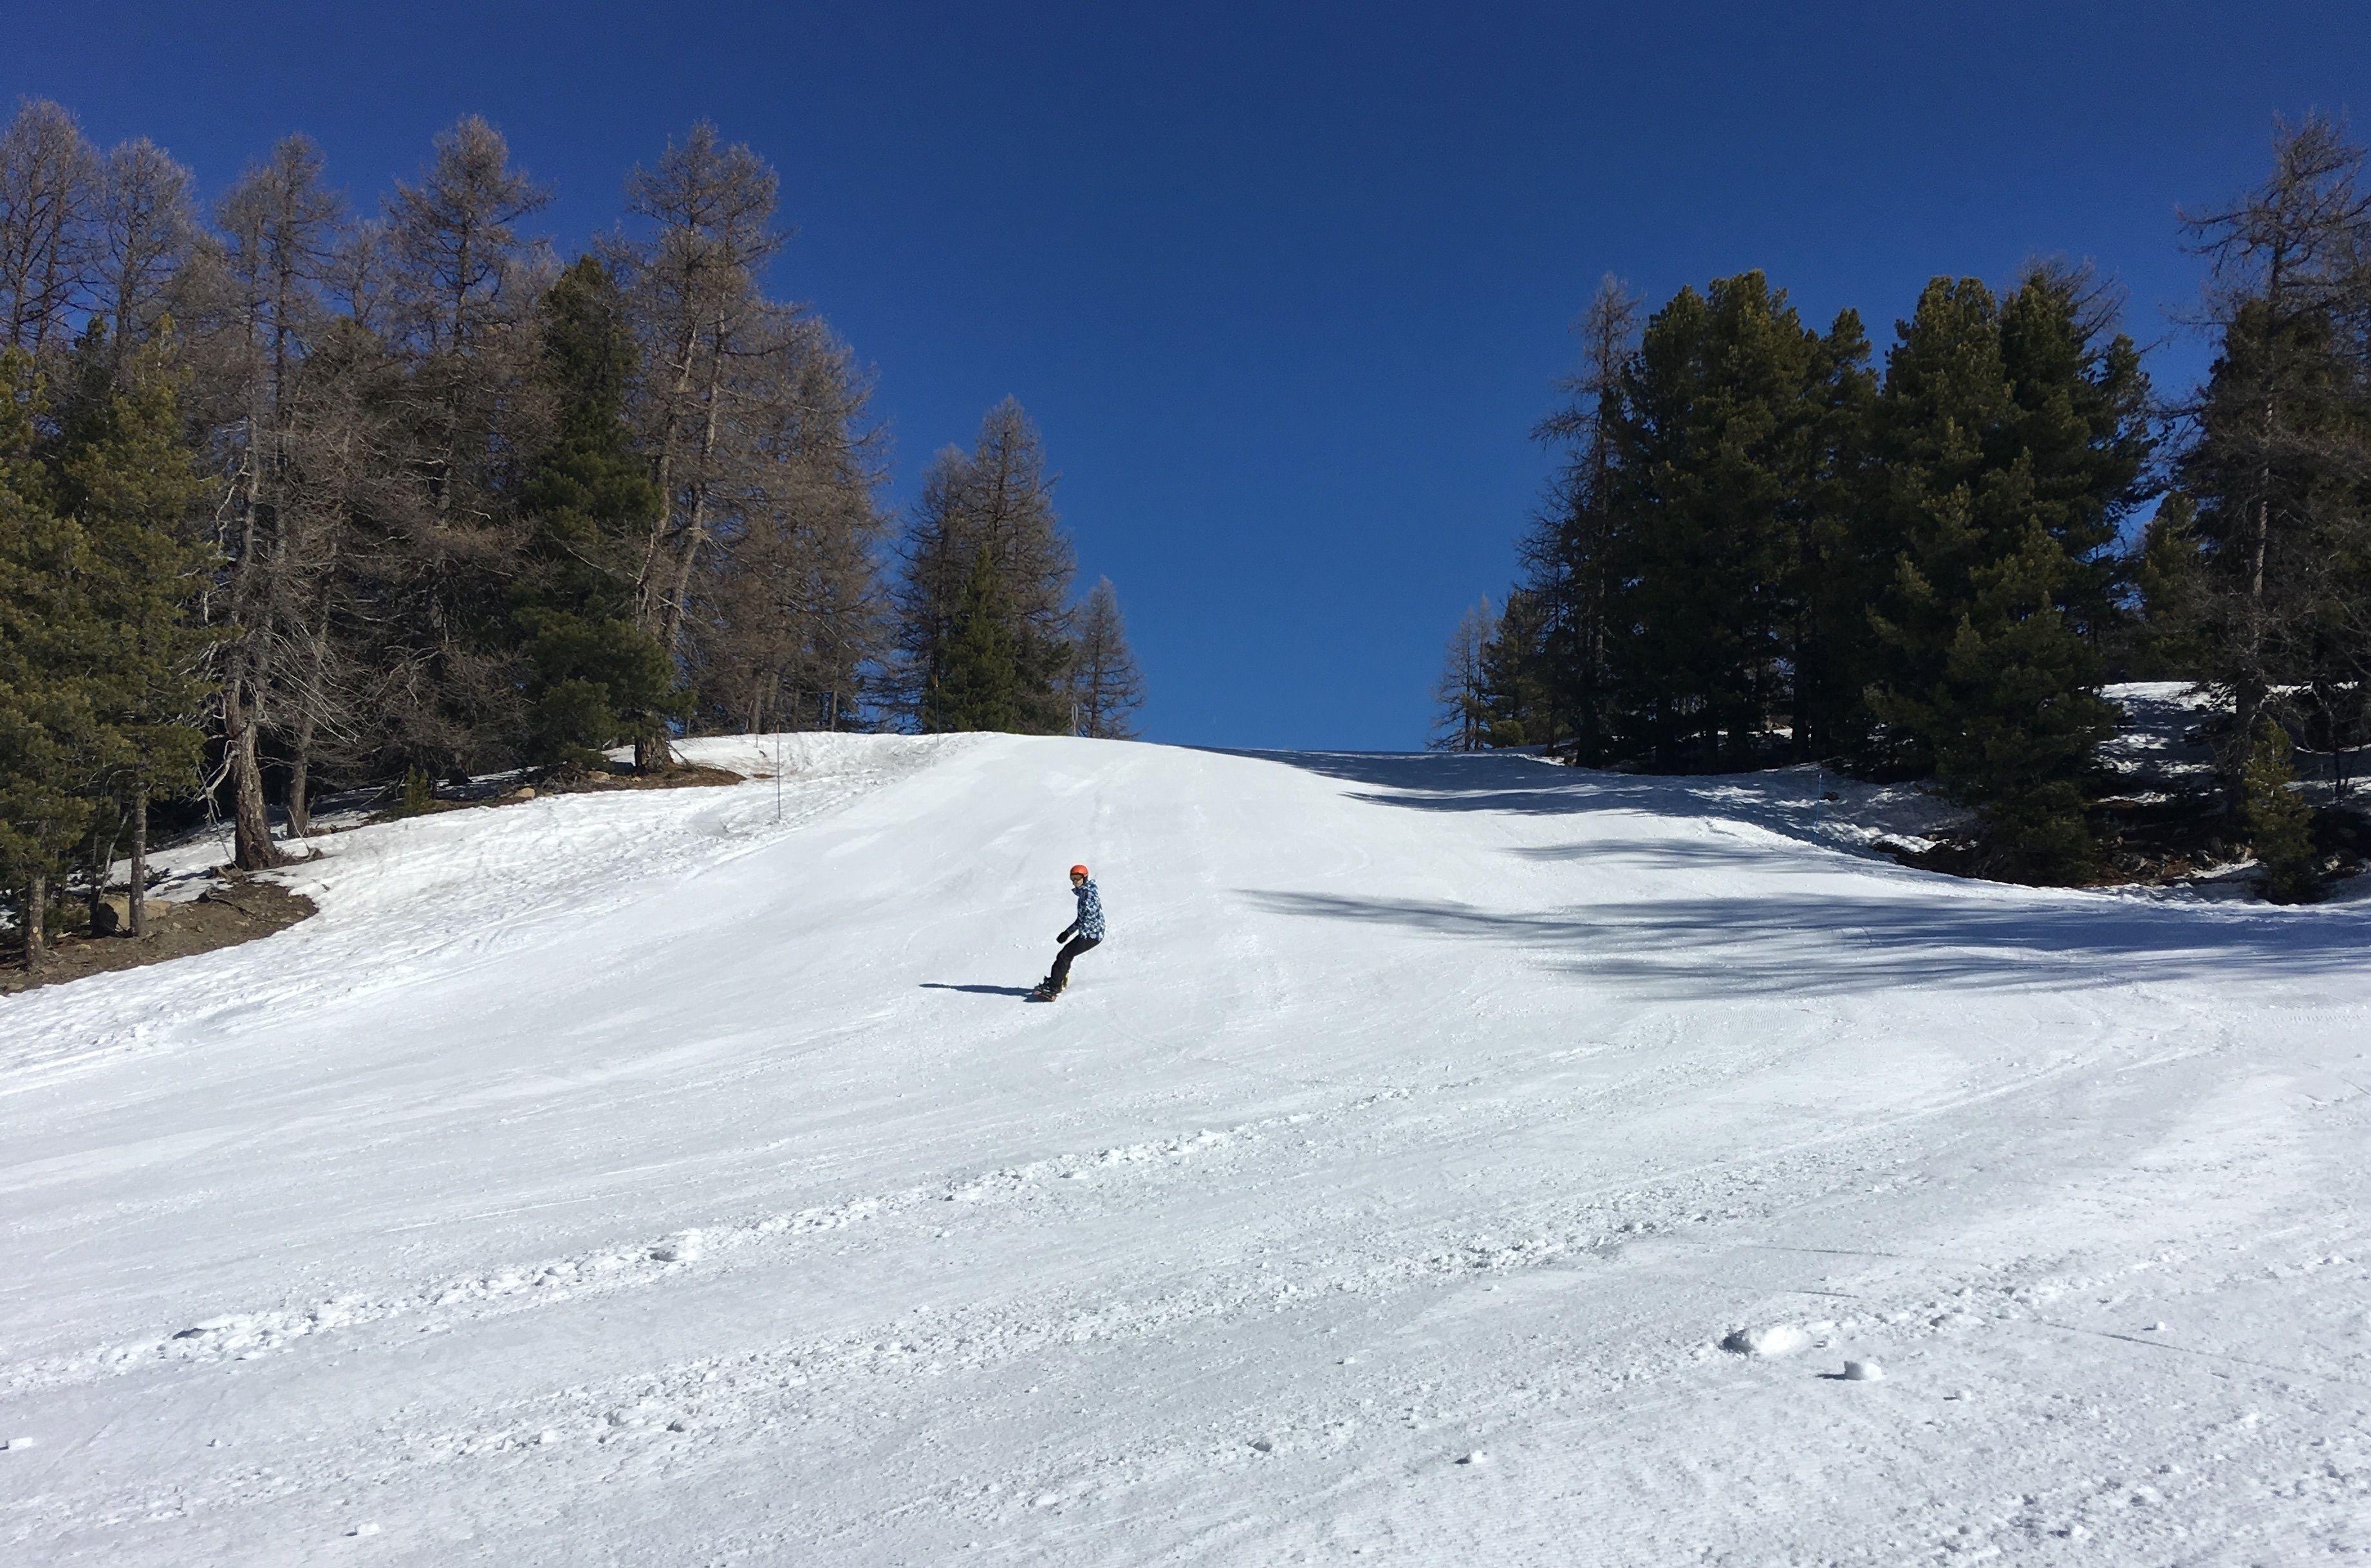 Hoe Franse skigebieden openbleven in Coronacrisis: verslag vanuit Risoul